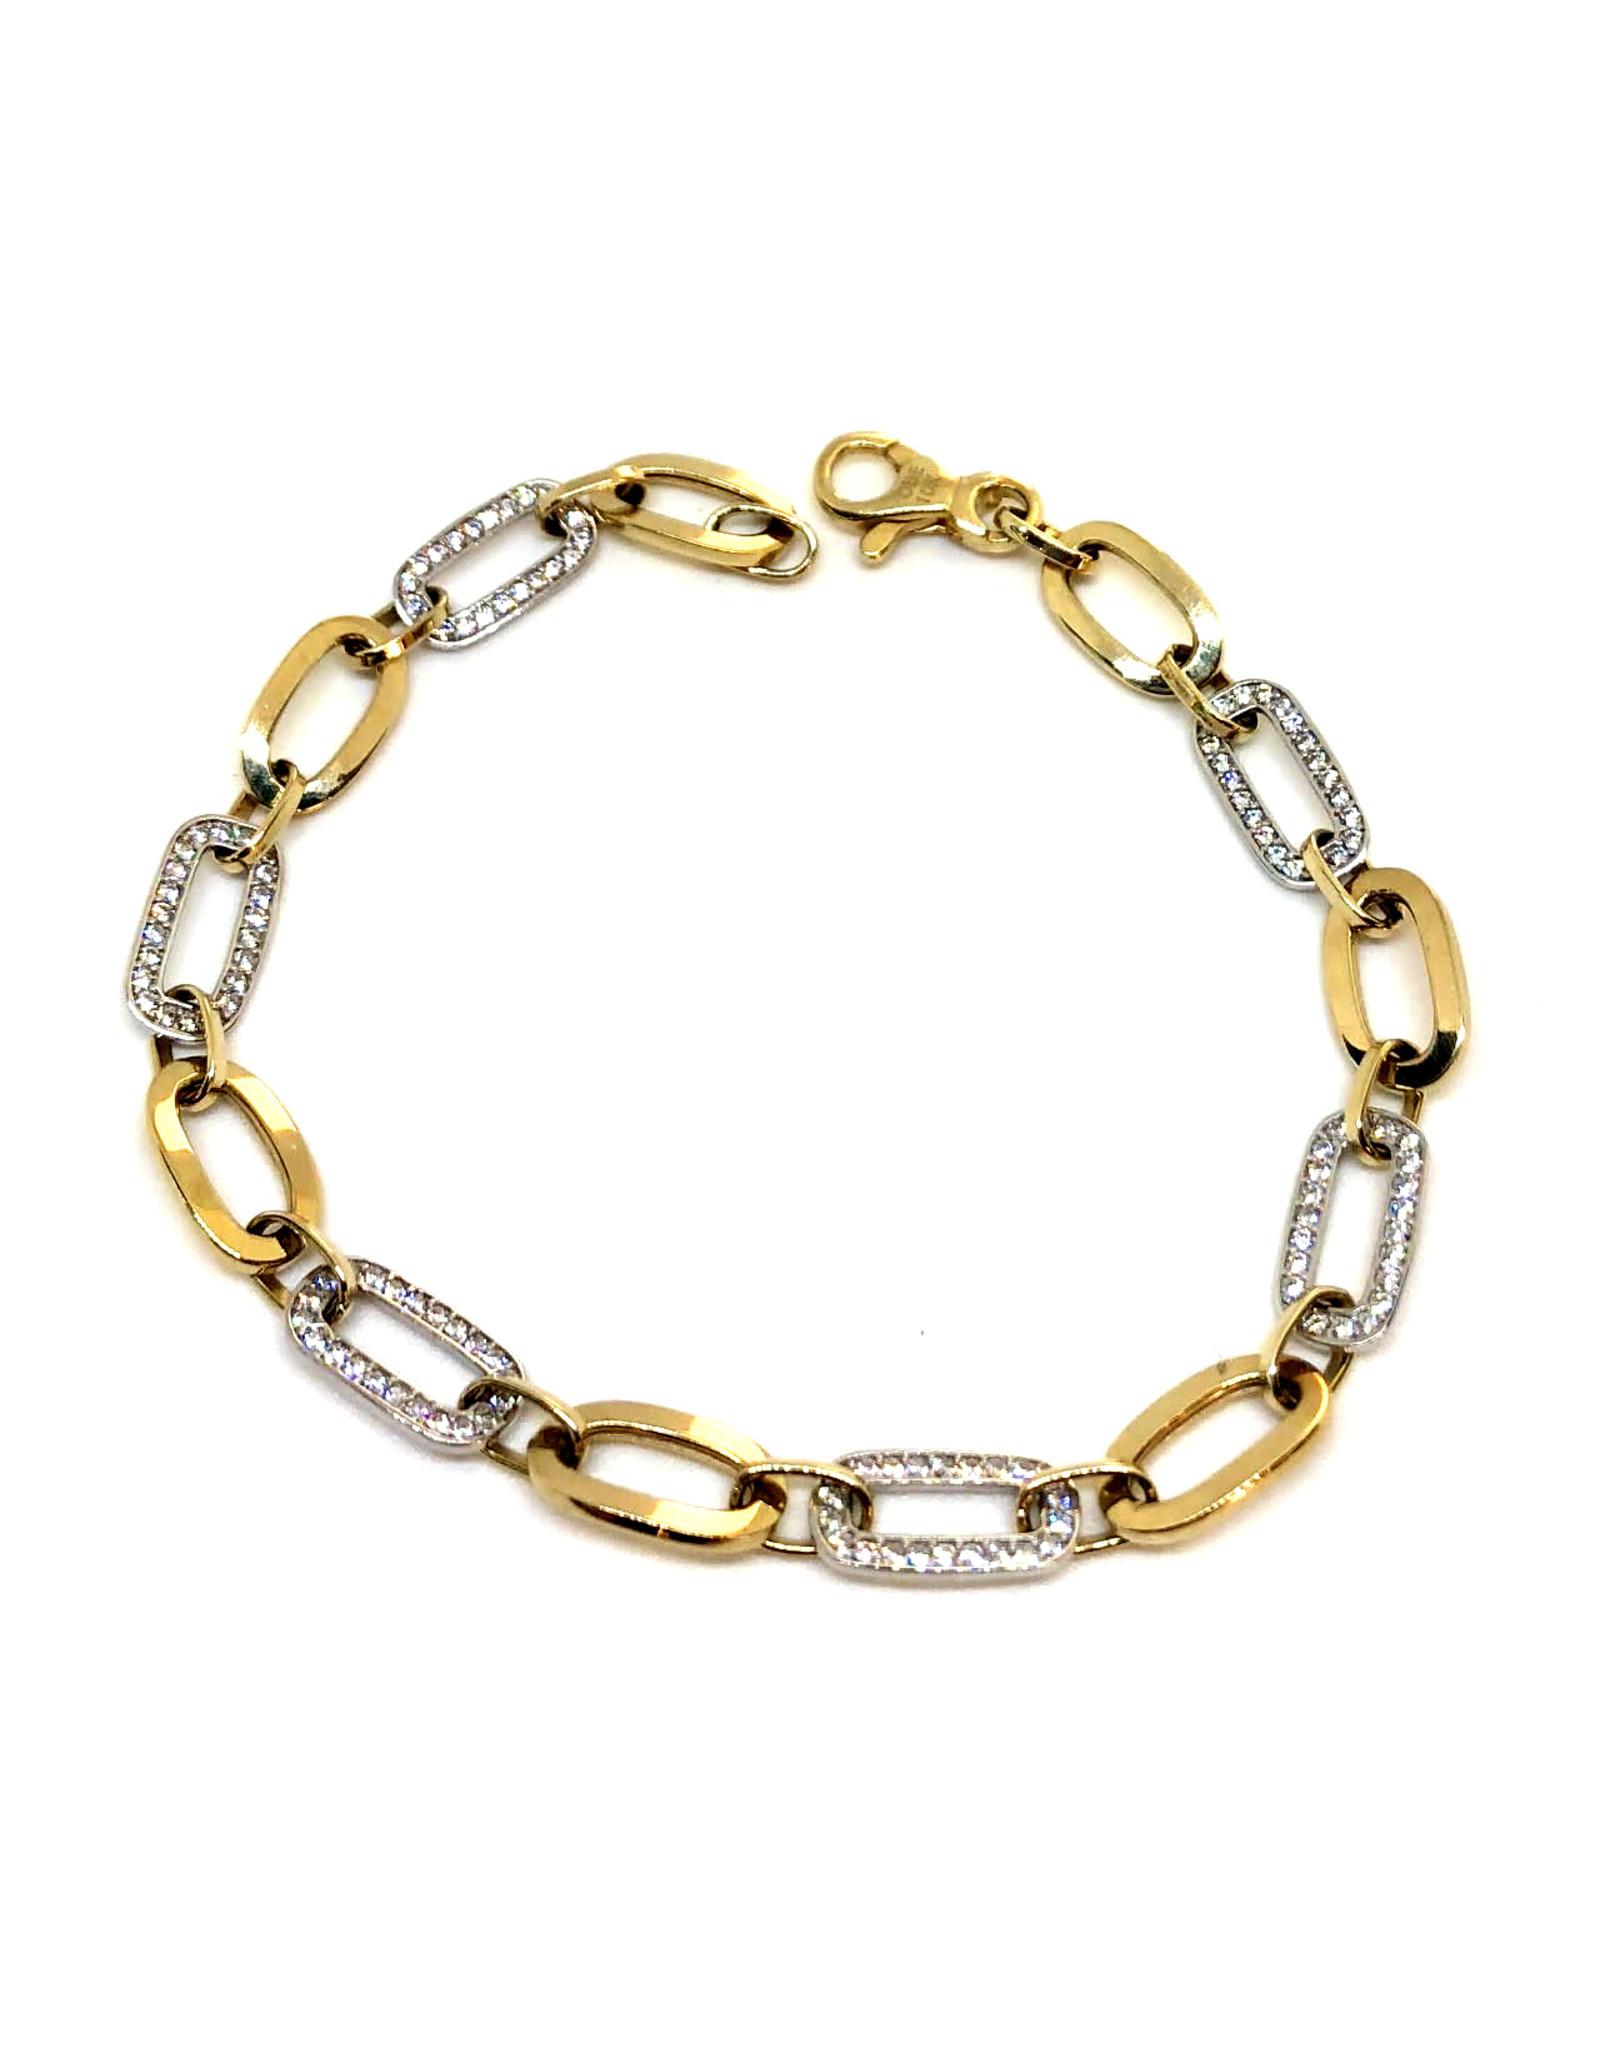 Bracelet Fantaisie Or 10K 2 tons